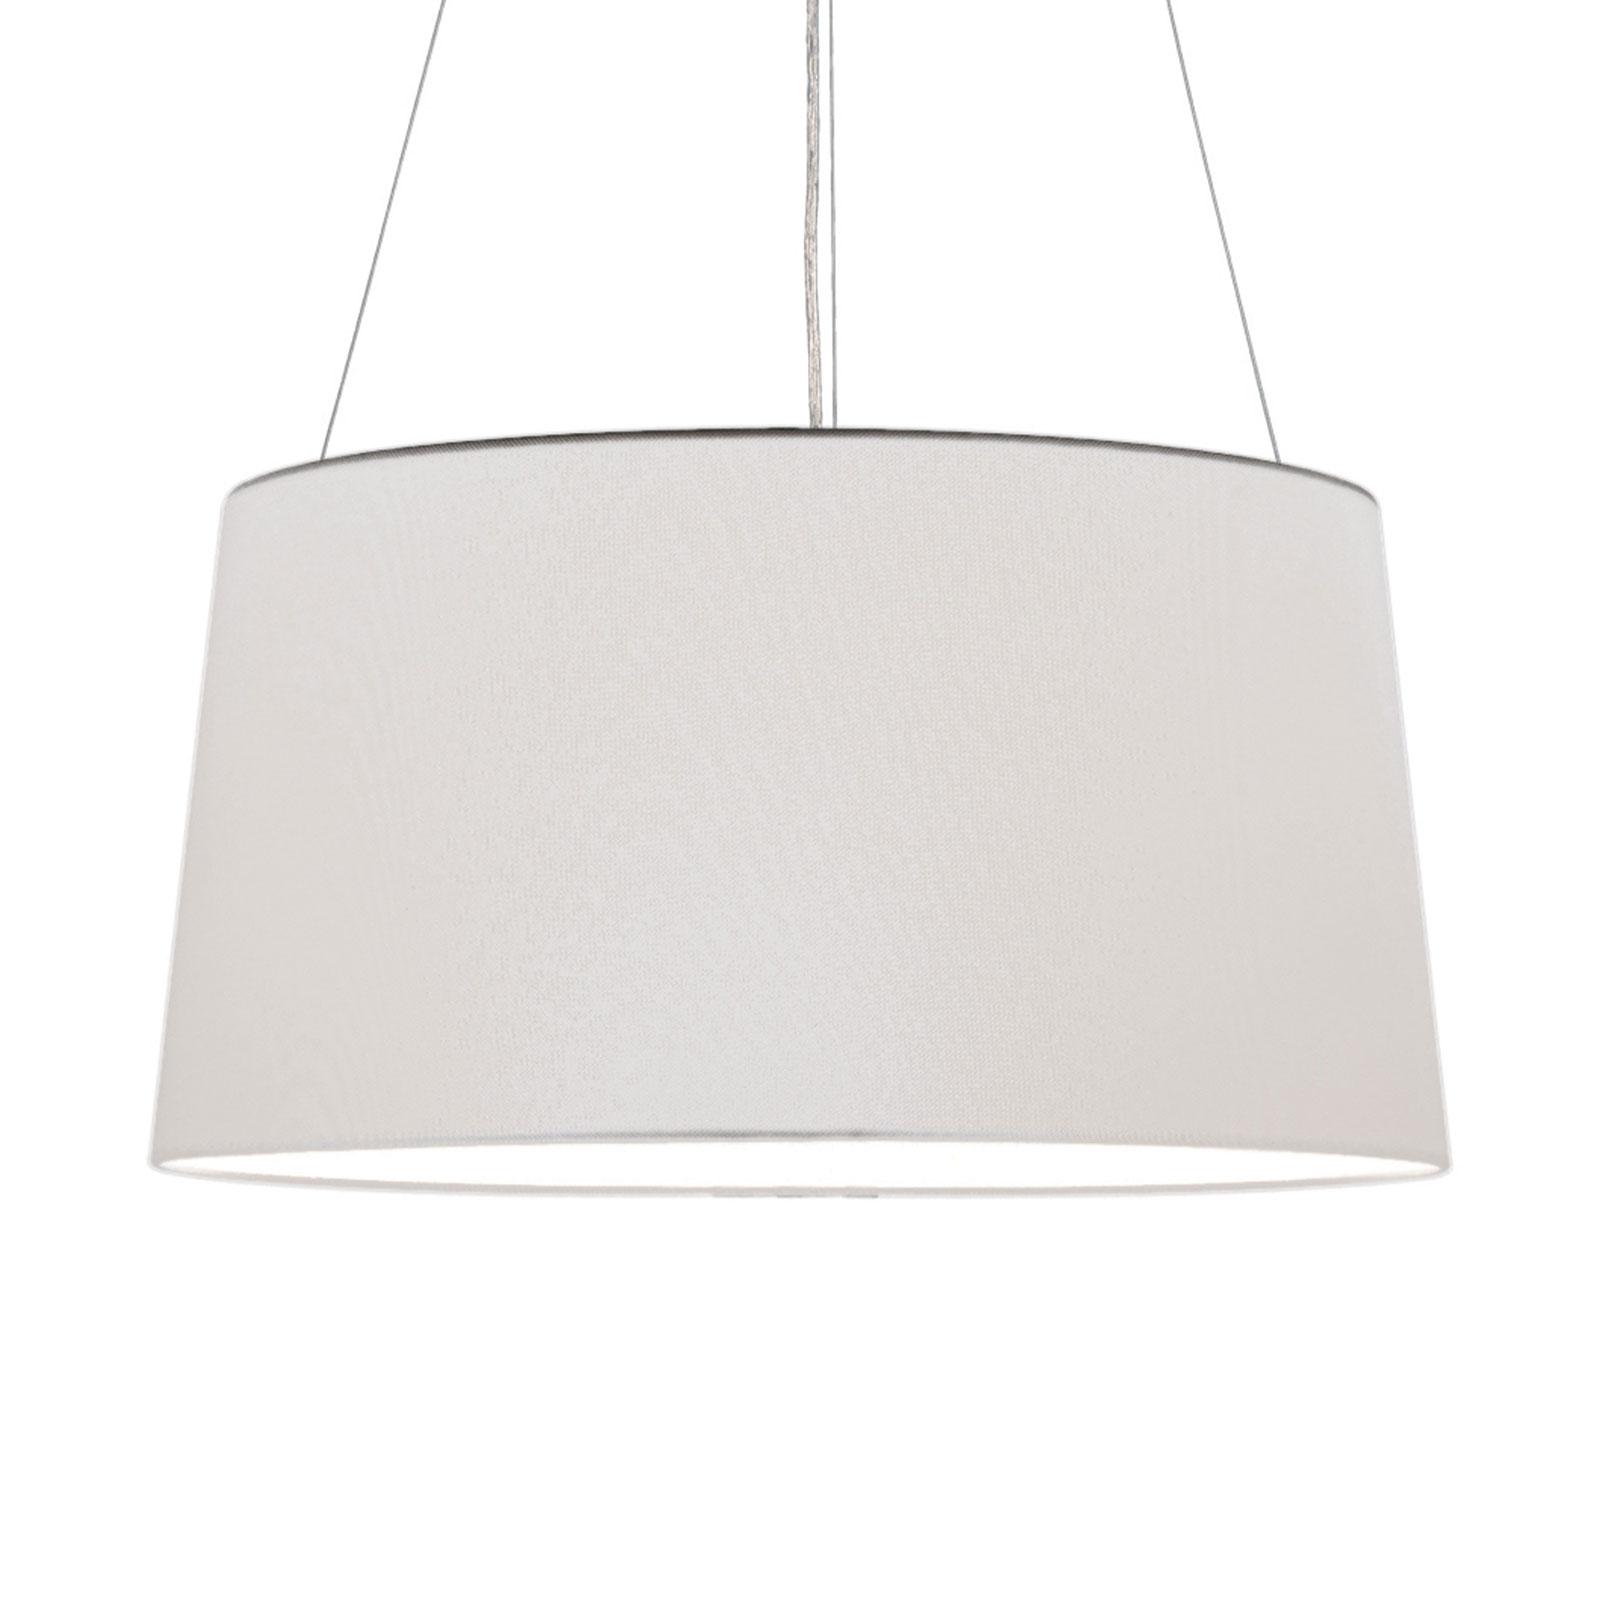 Kundalini Tripod lampa wisząca, biała